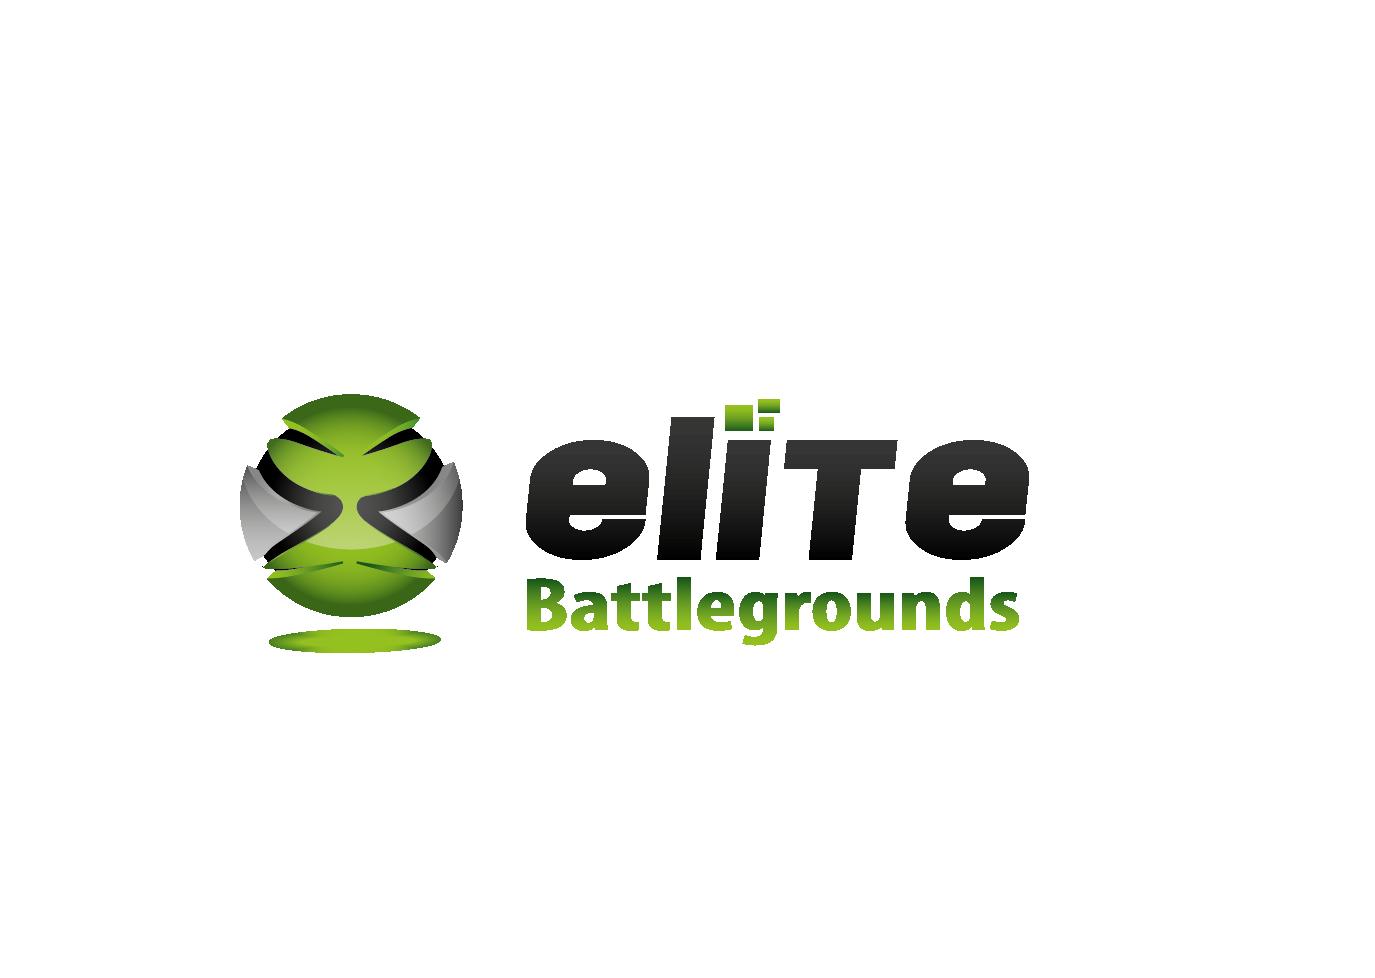 Logo Design by 354studio - Entry No. 82 in the Logo Design Contest Creative Logo Design for Elite Battlegrounds.